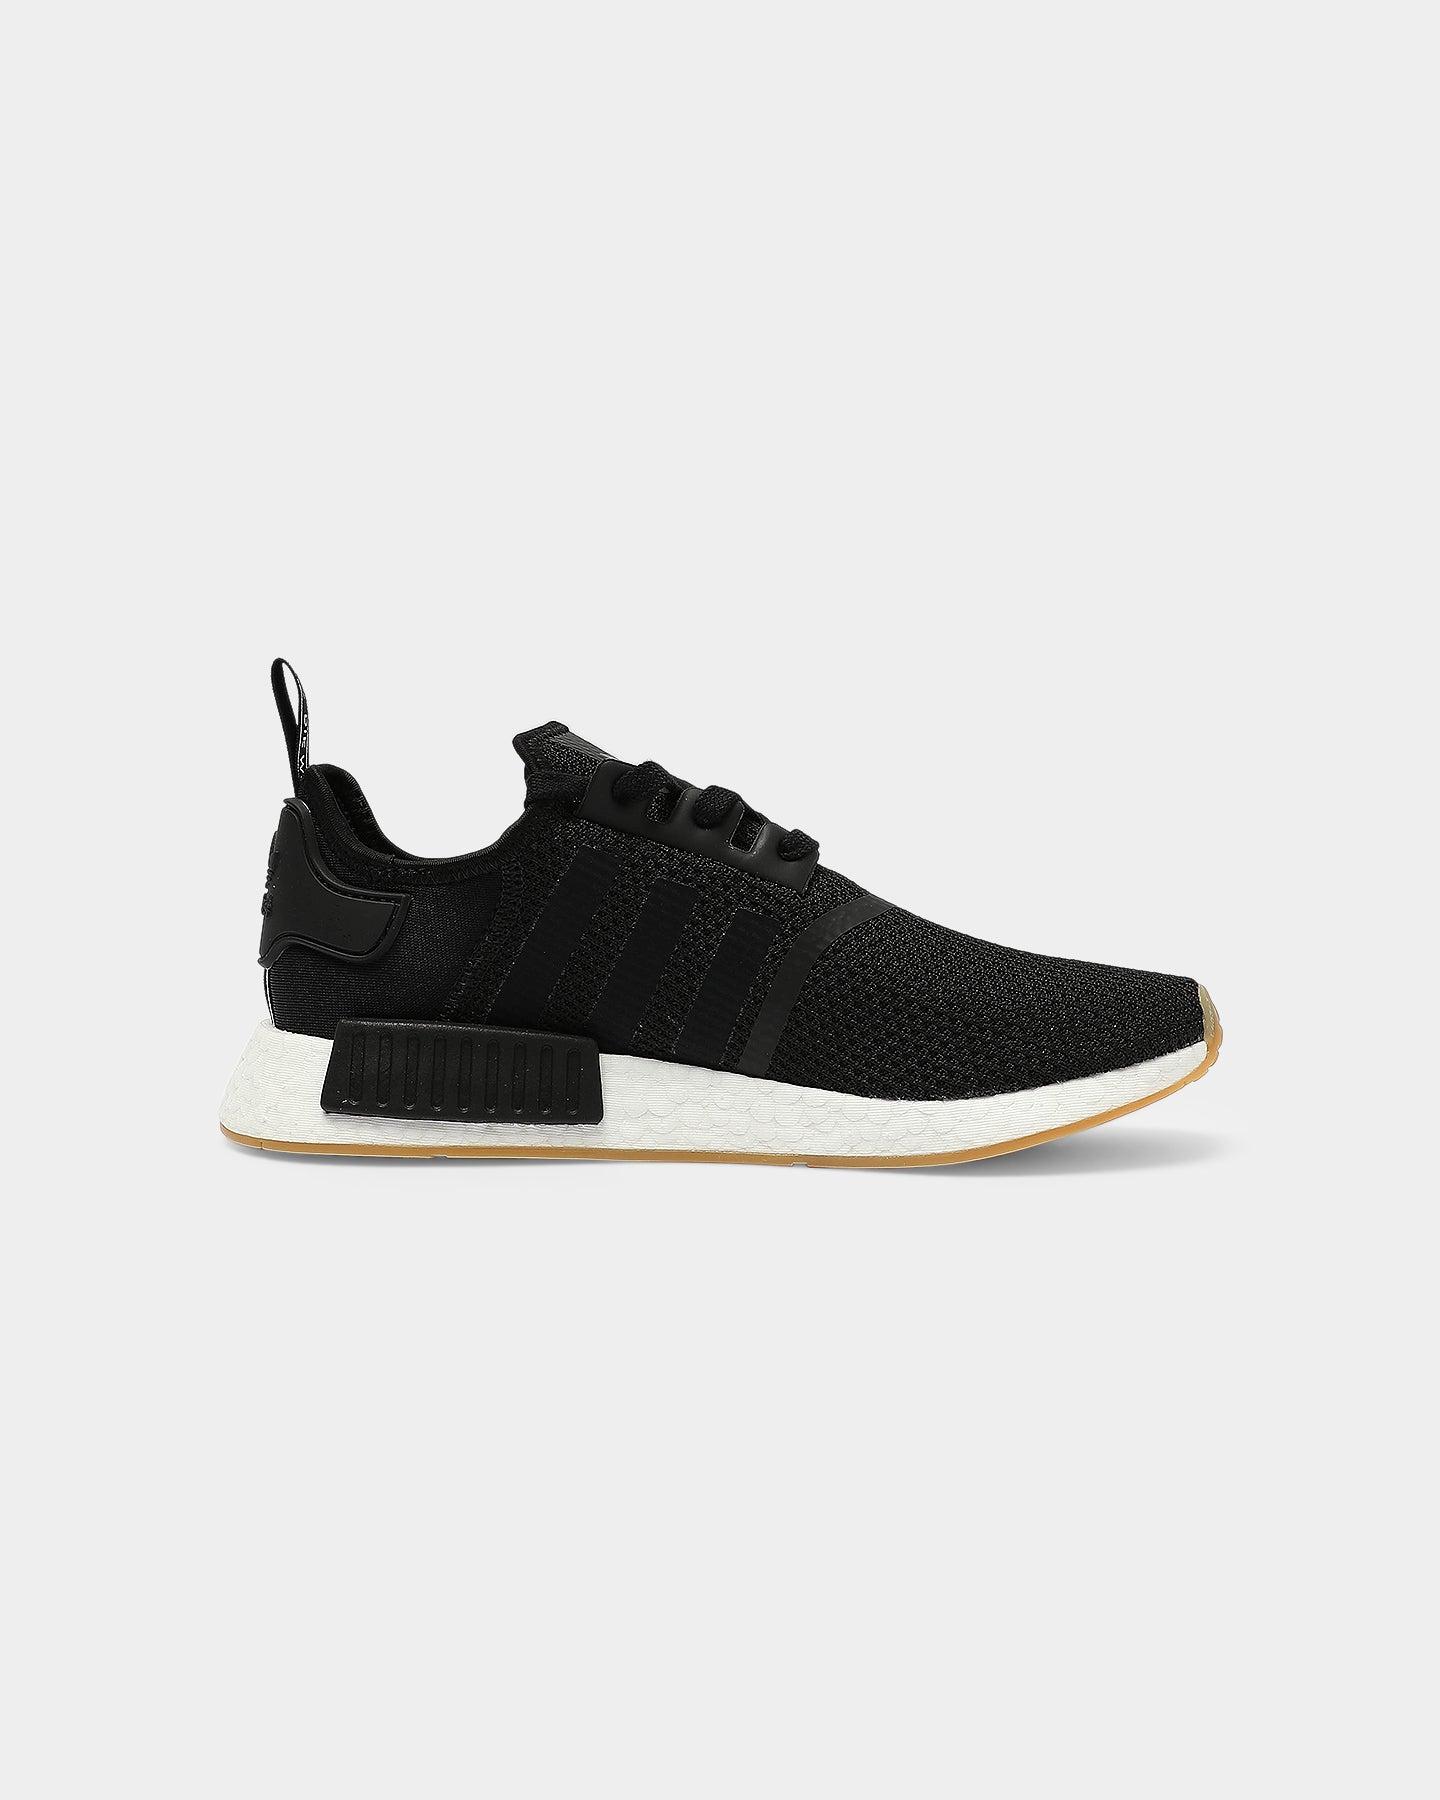 Adidas NMD R1 Gum Pack Black | Adidas nmd r1, Adidas nmd